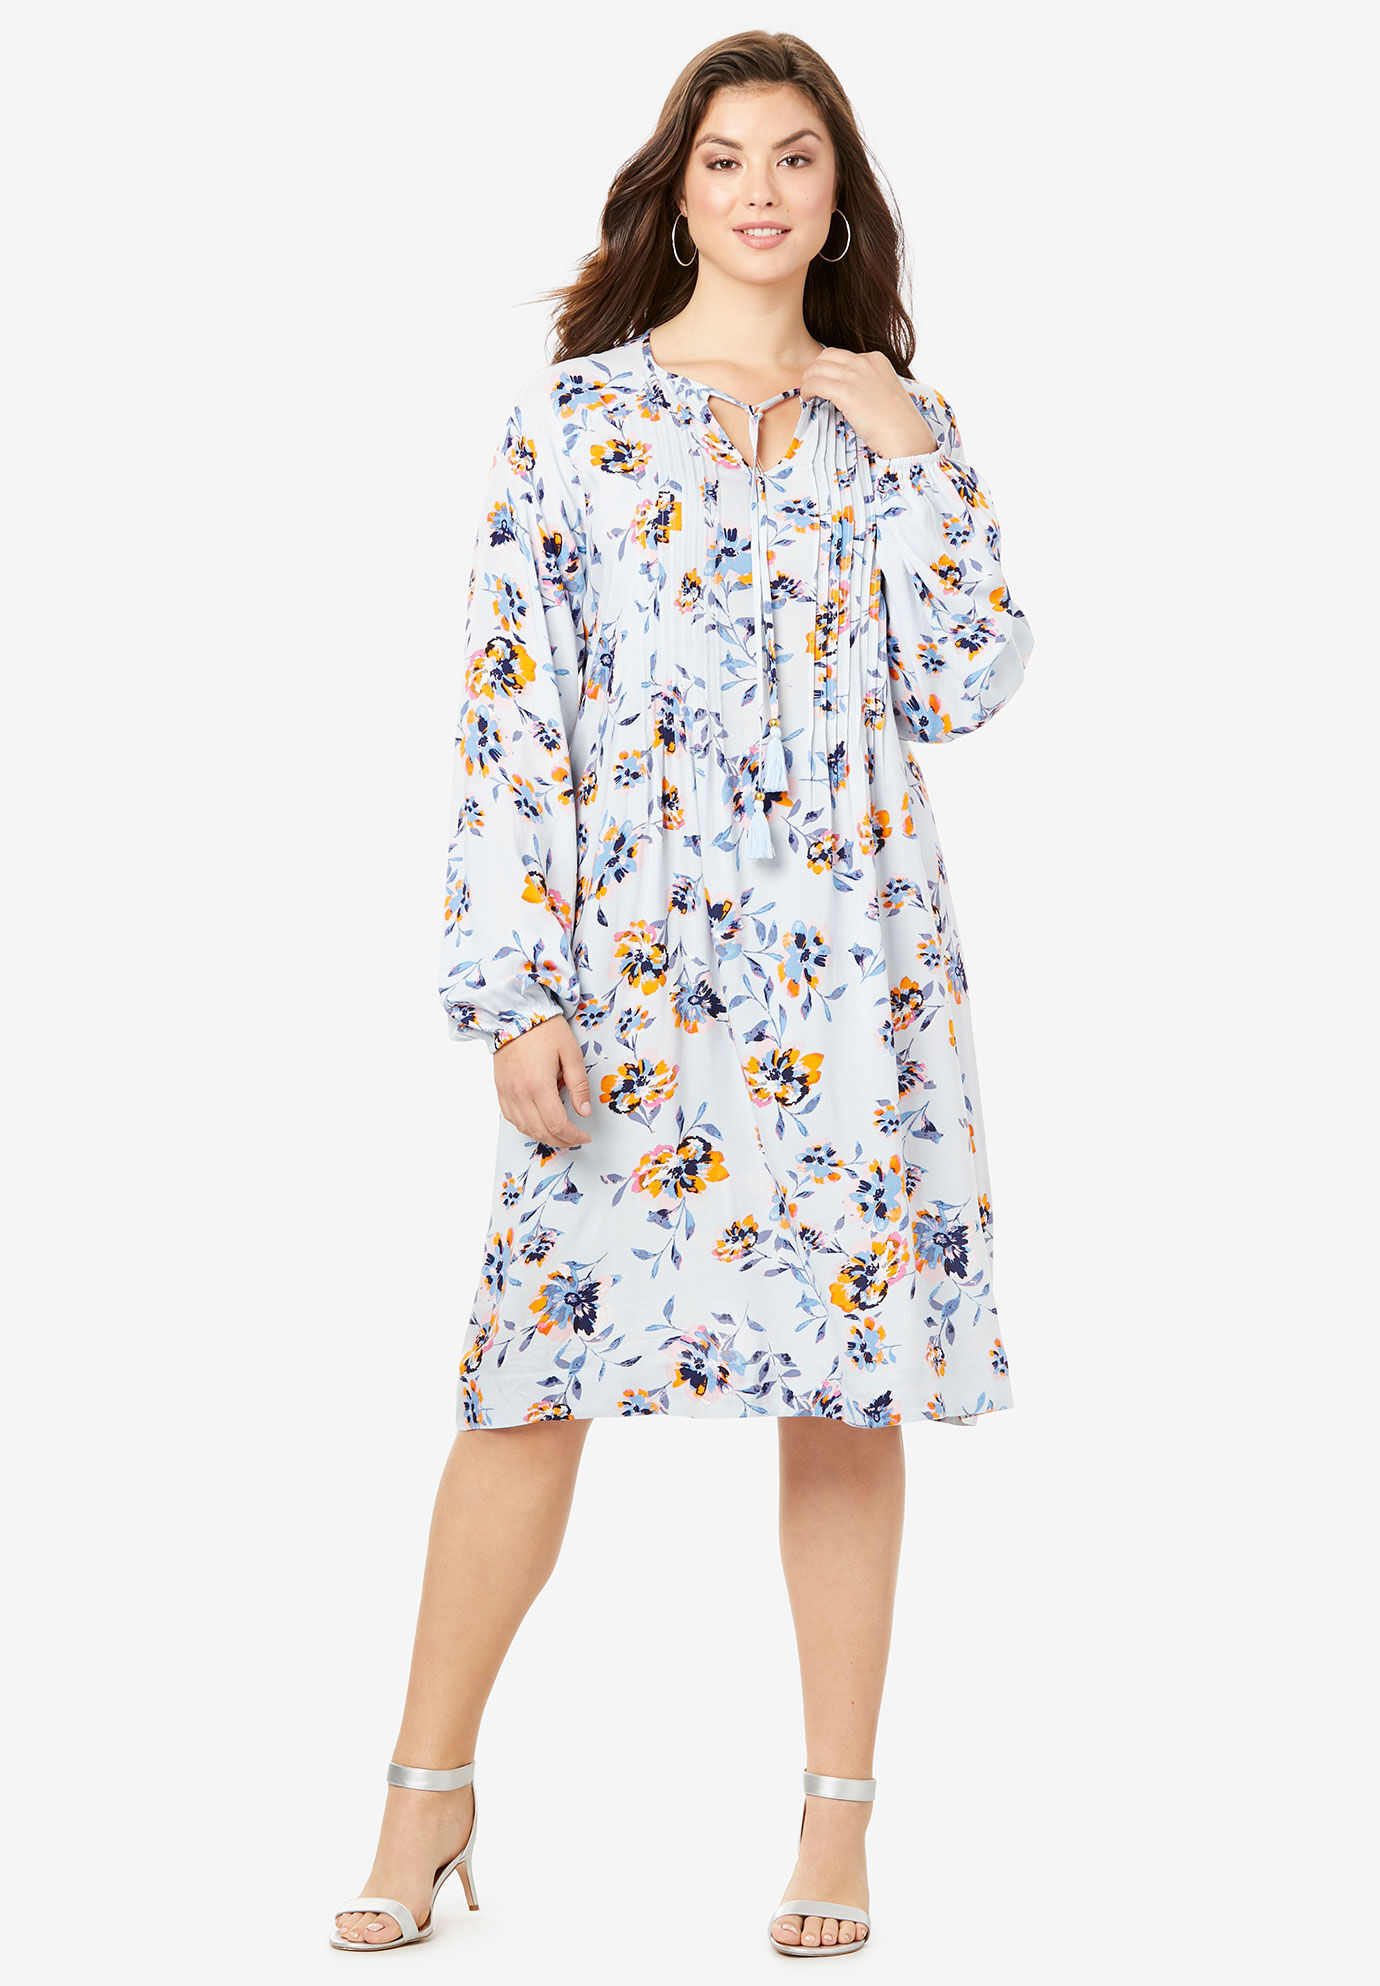 12 W Navy Roamans Womens Plus Size Twist Front Dress